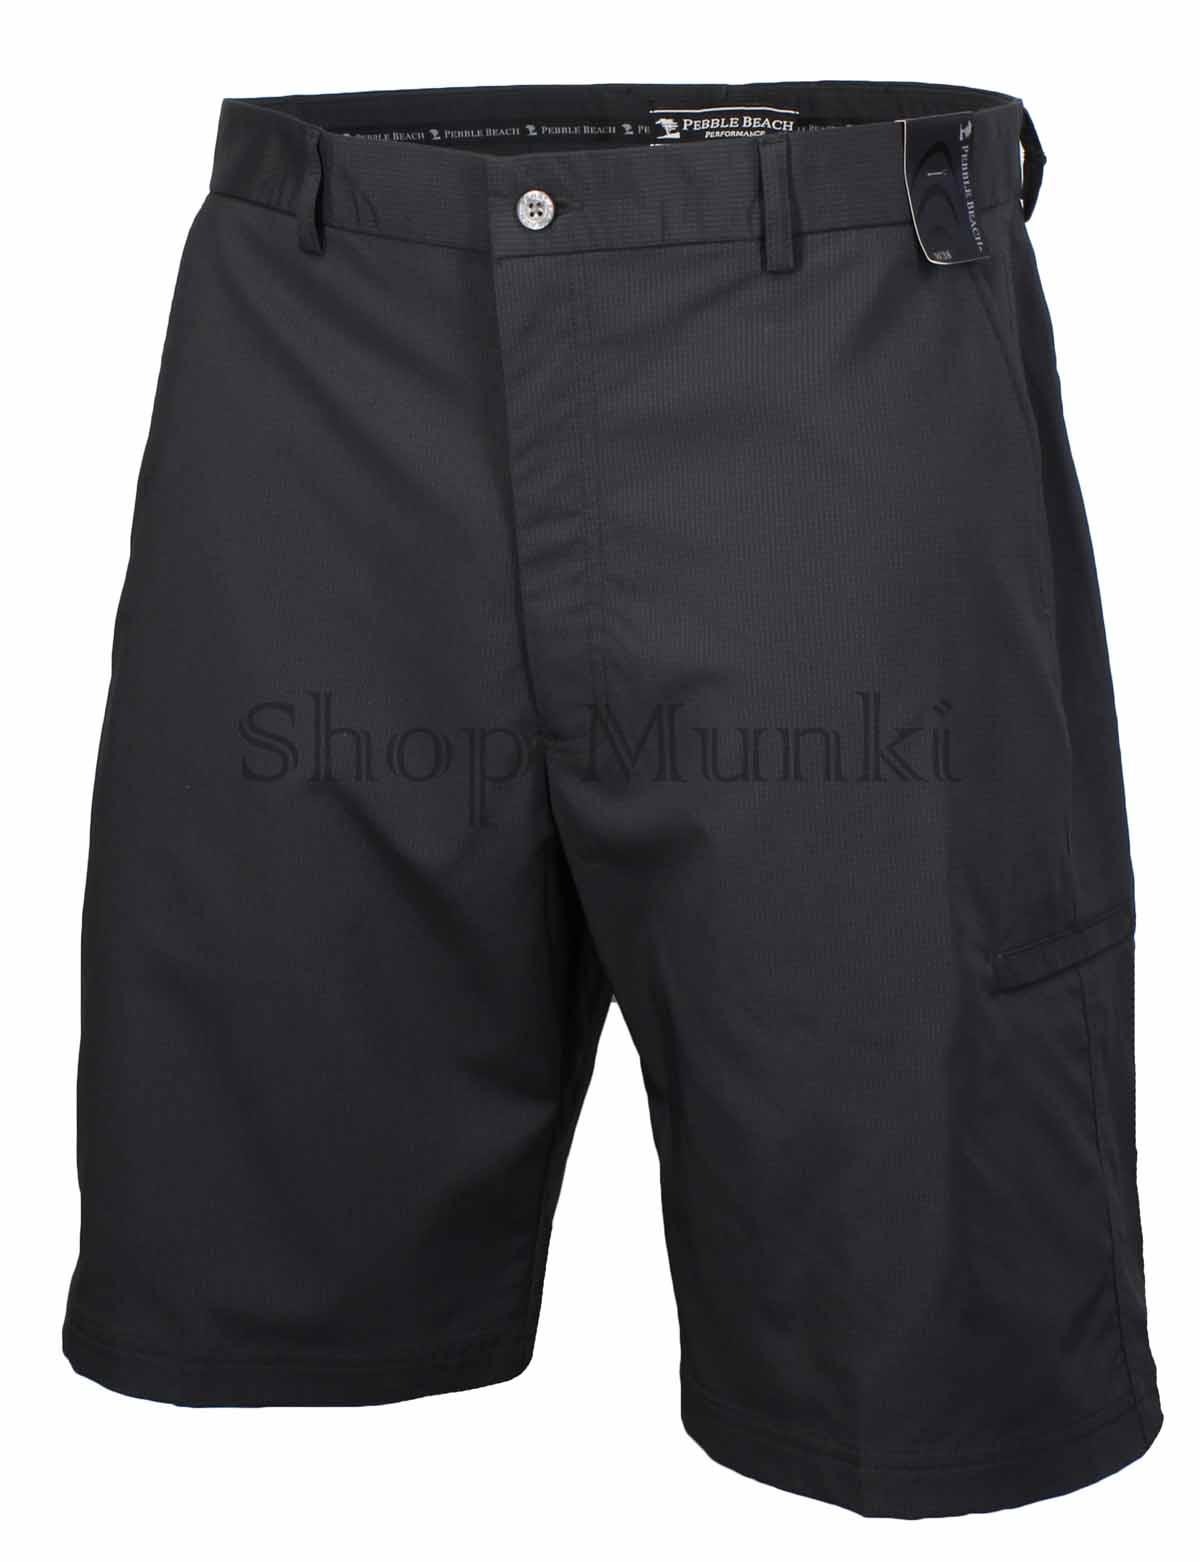 pebble beach men Pebble beach men's grey full zip long sleeve performance sweater large(#b2) | sporting goods, golf, golf clothing, shoes & accs | ebay.